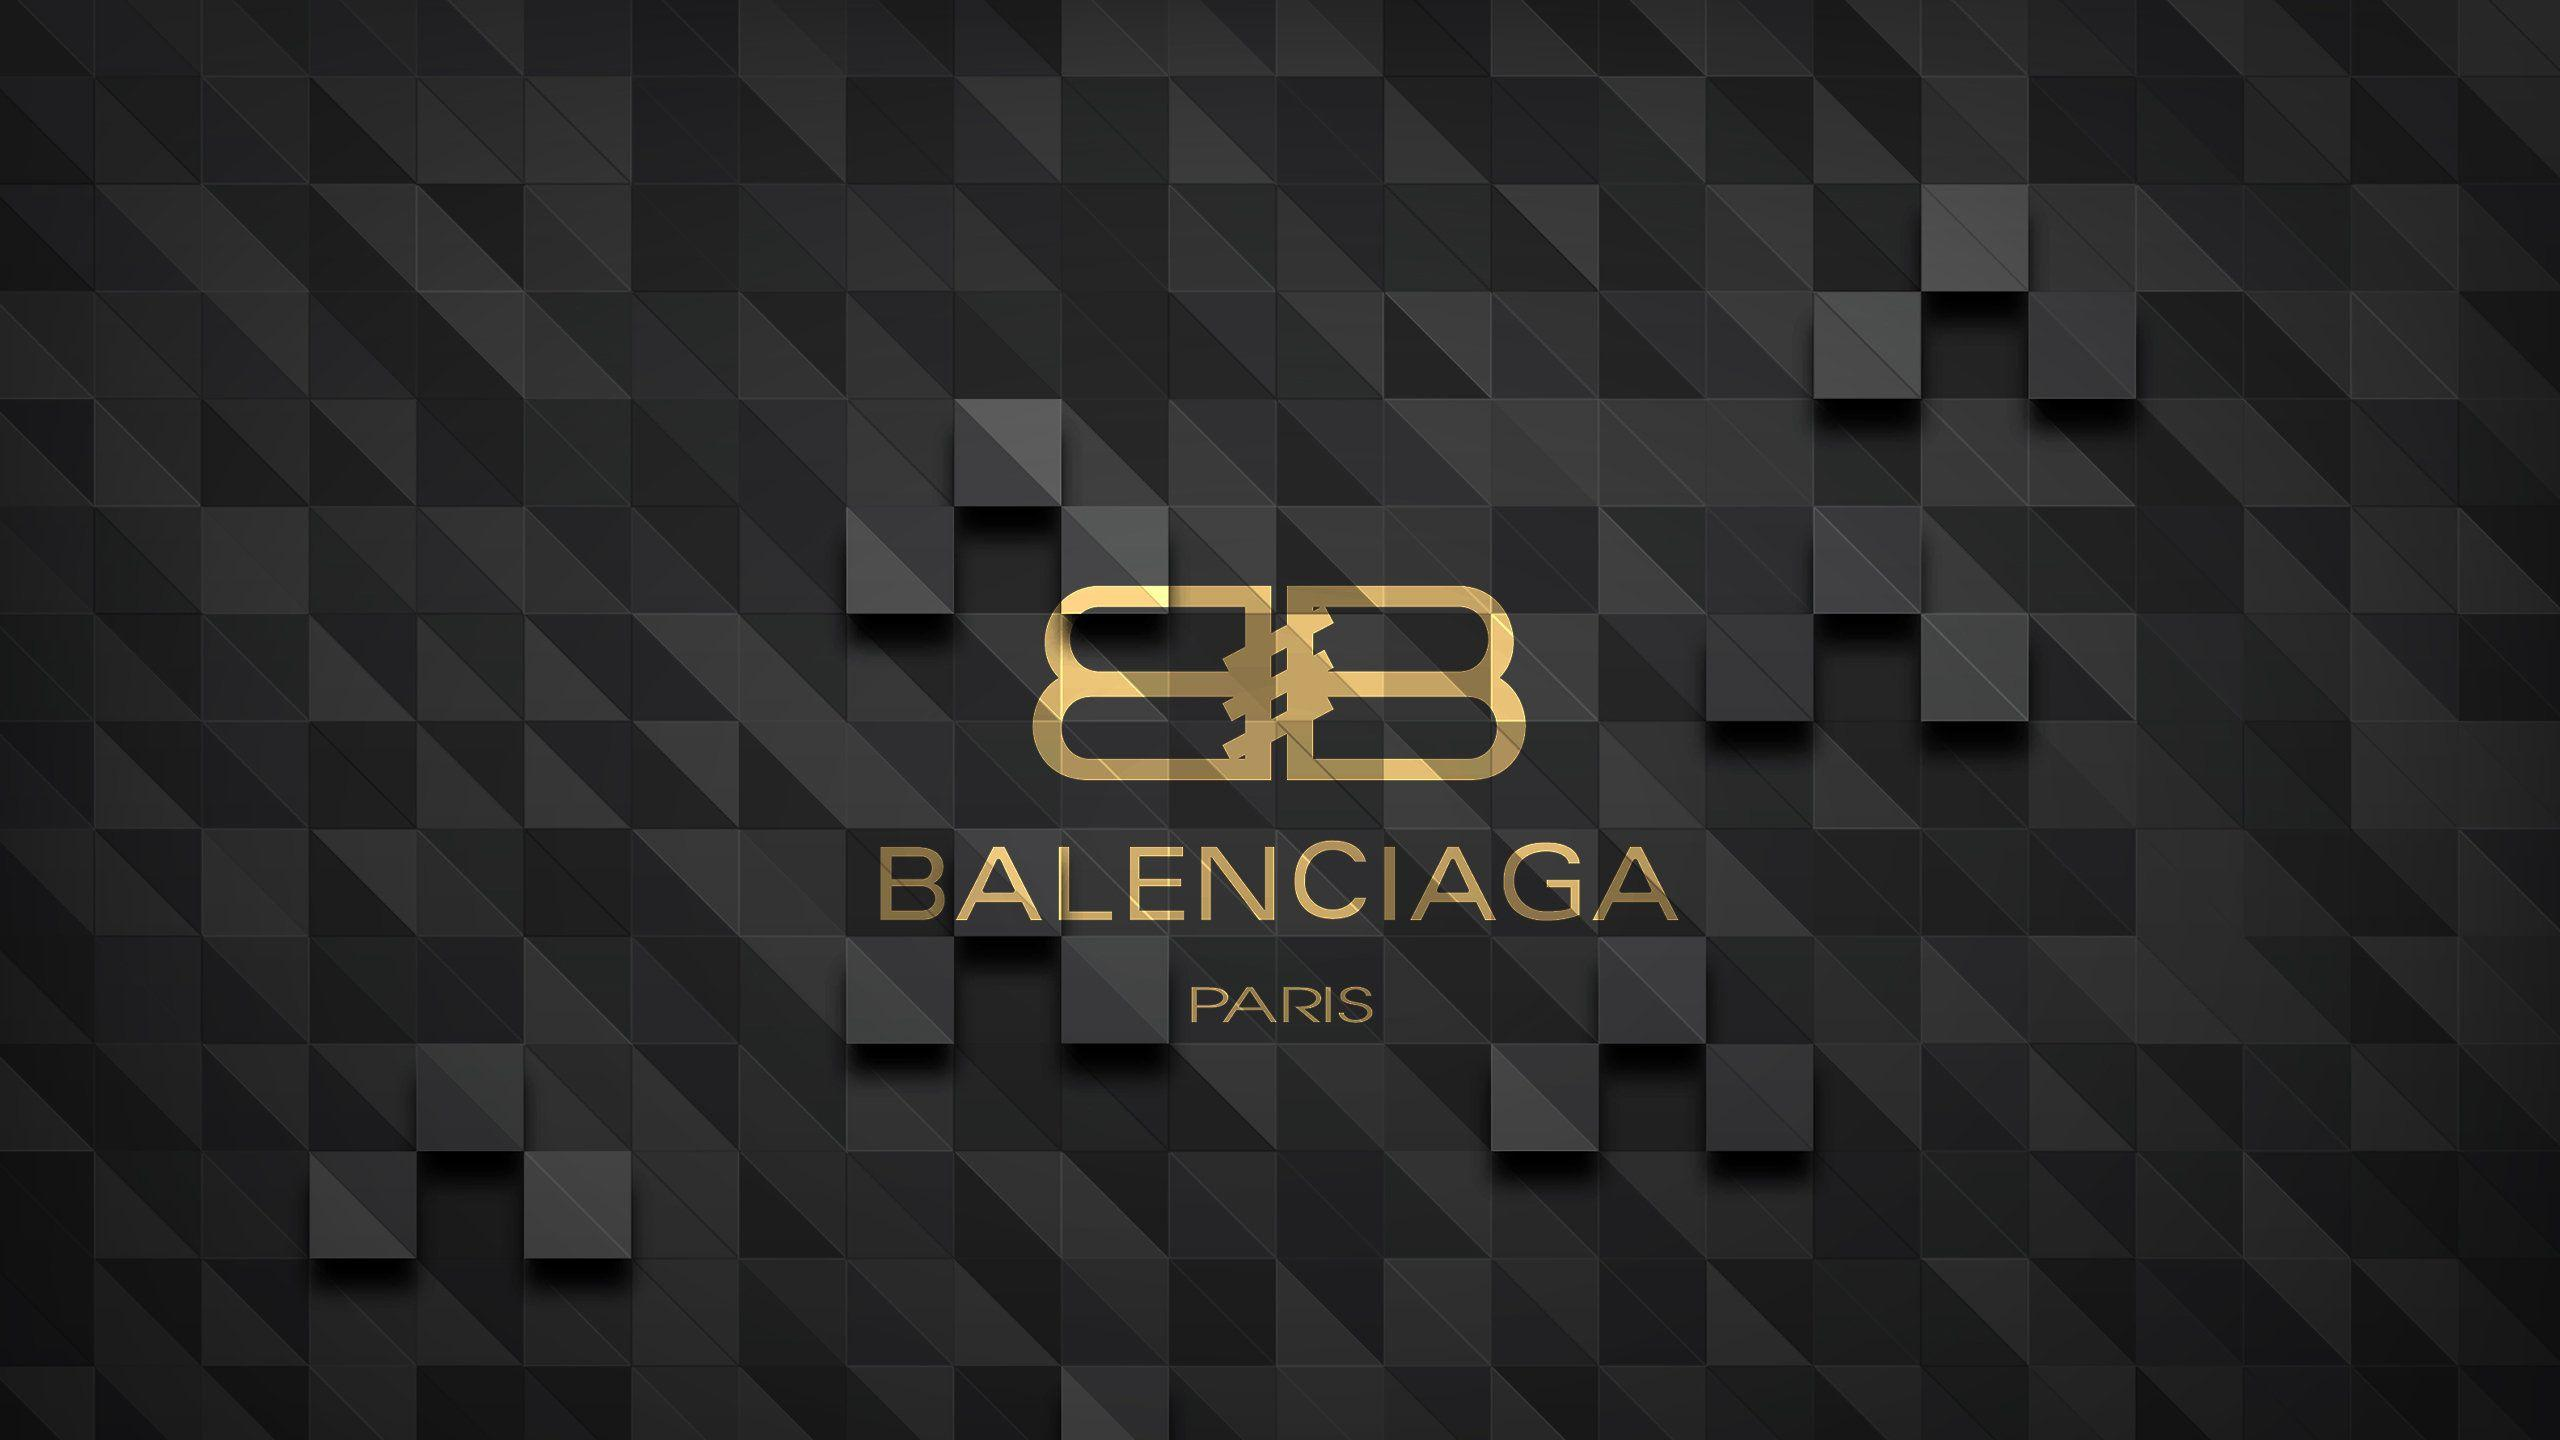 balenciaga wallpapers wang golf desktop background backgrounds cat wallpaperplay wallpaperaccess 4kwallpaper wiki